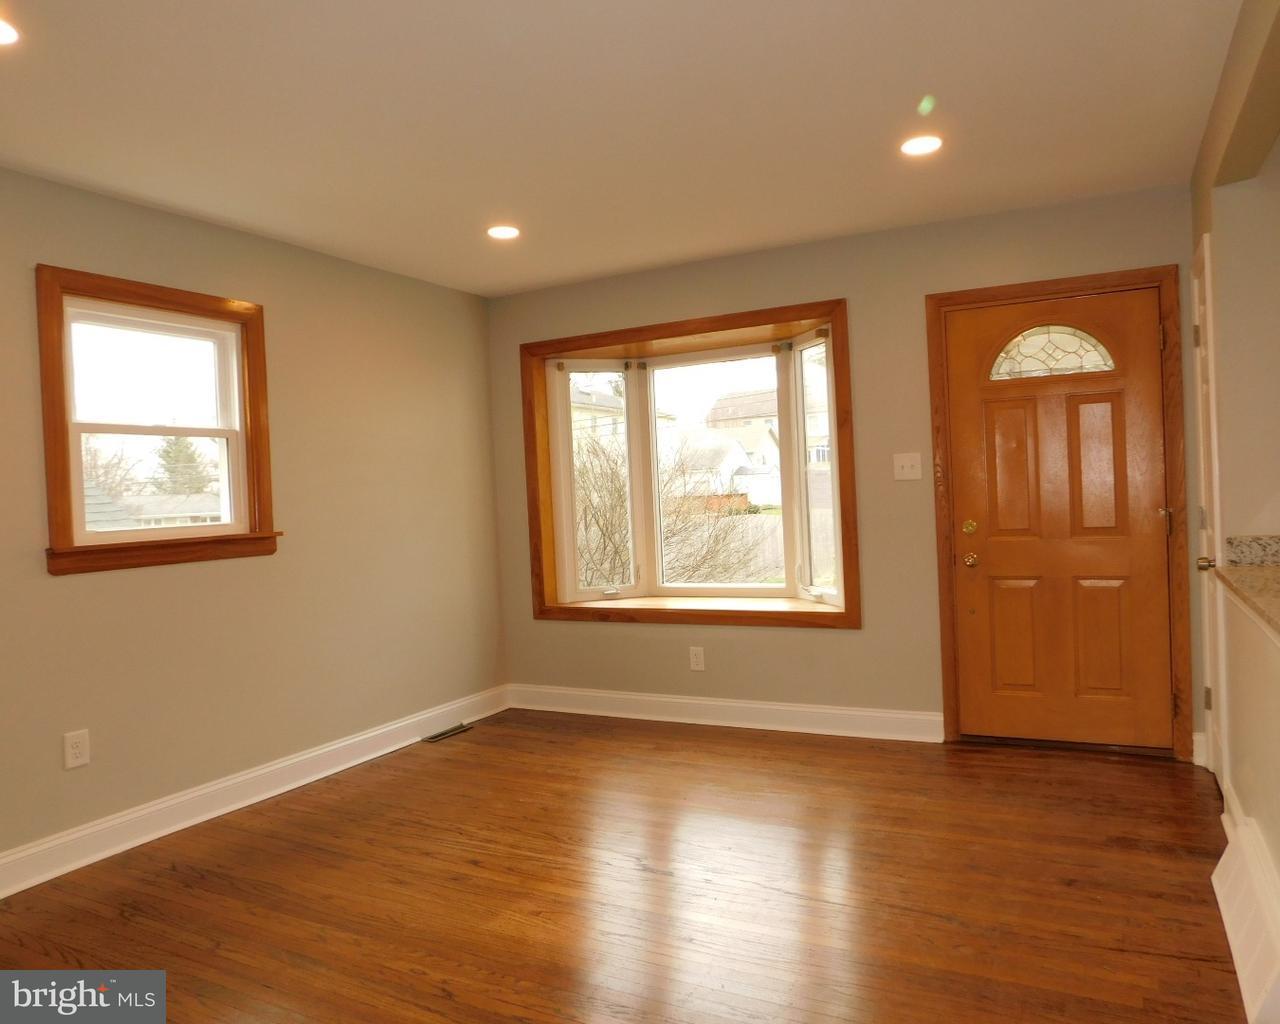 205 CEDAR RD, WALLINGFORD - Listed at $249,900, WALLINGFORD